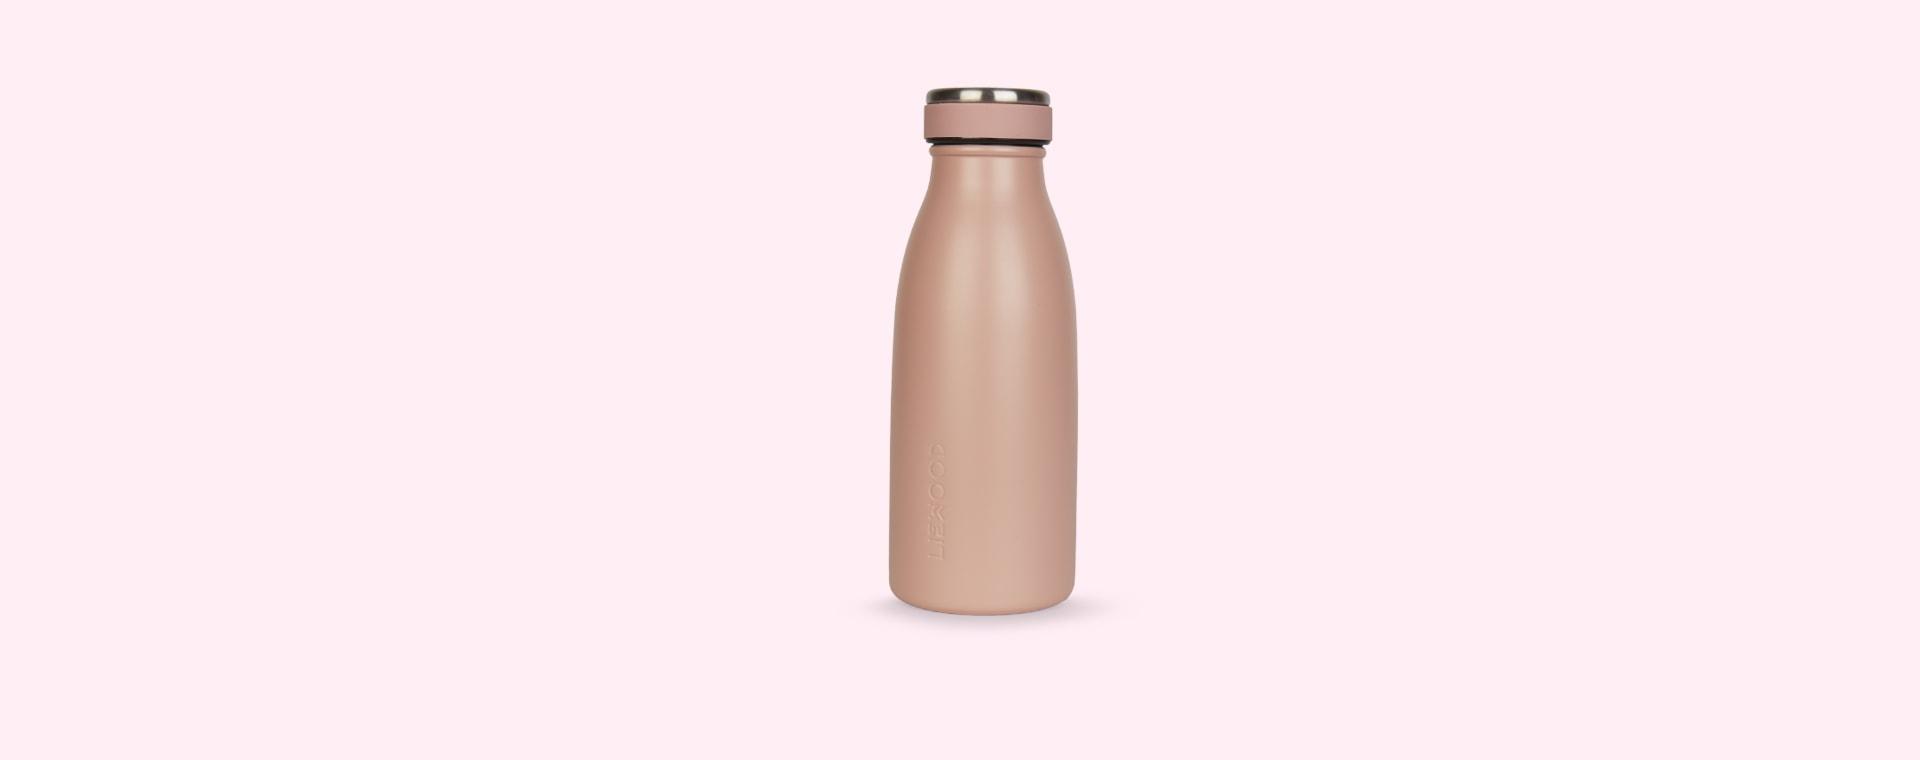 Coral Blush Liewood Estella Water Bottle